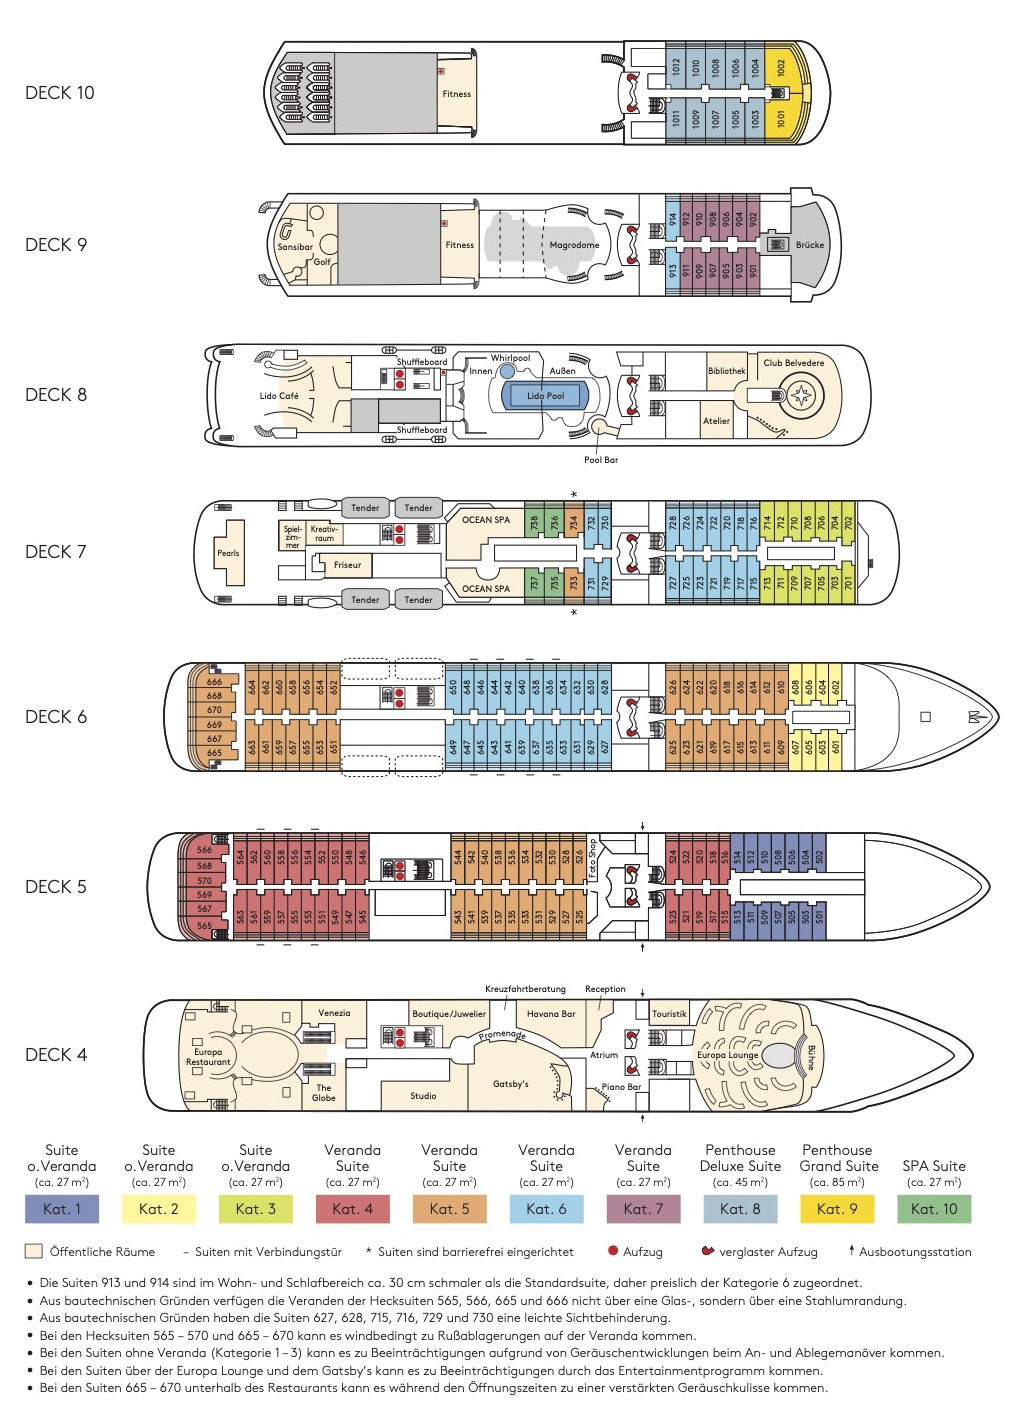 Deckplan MS EUROPA